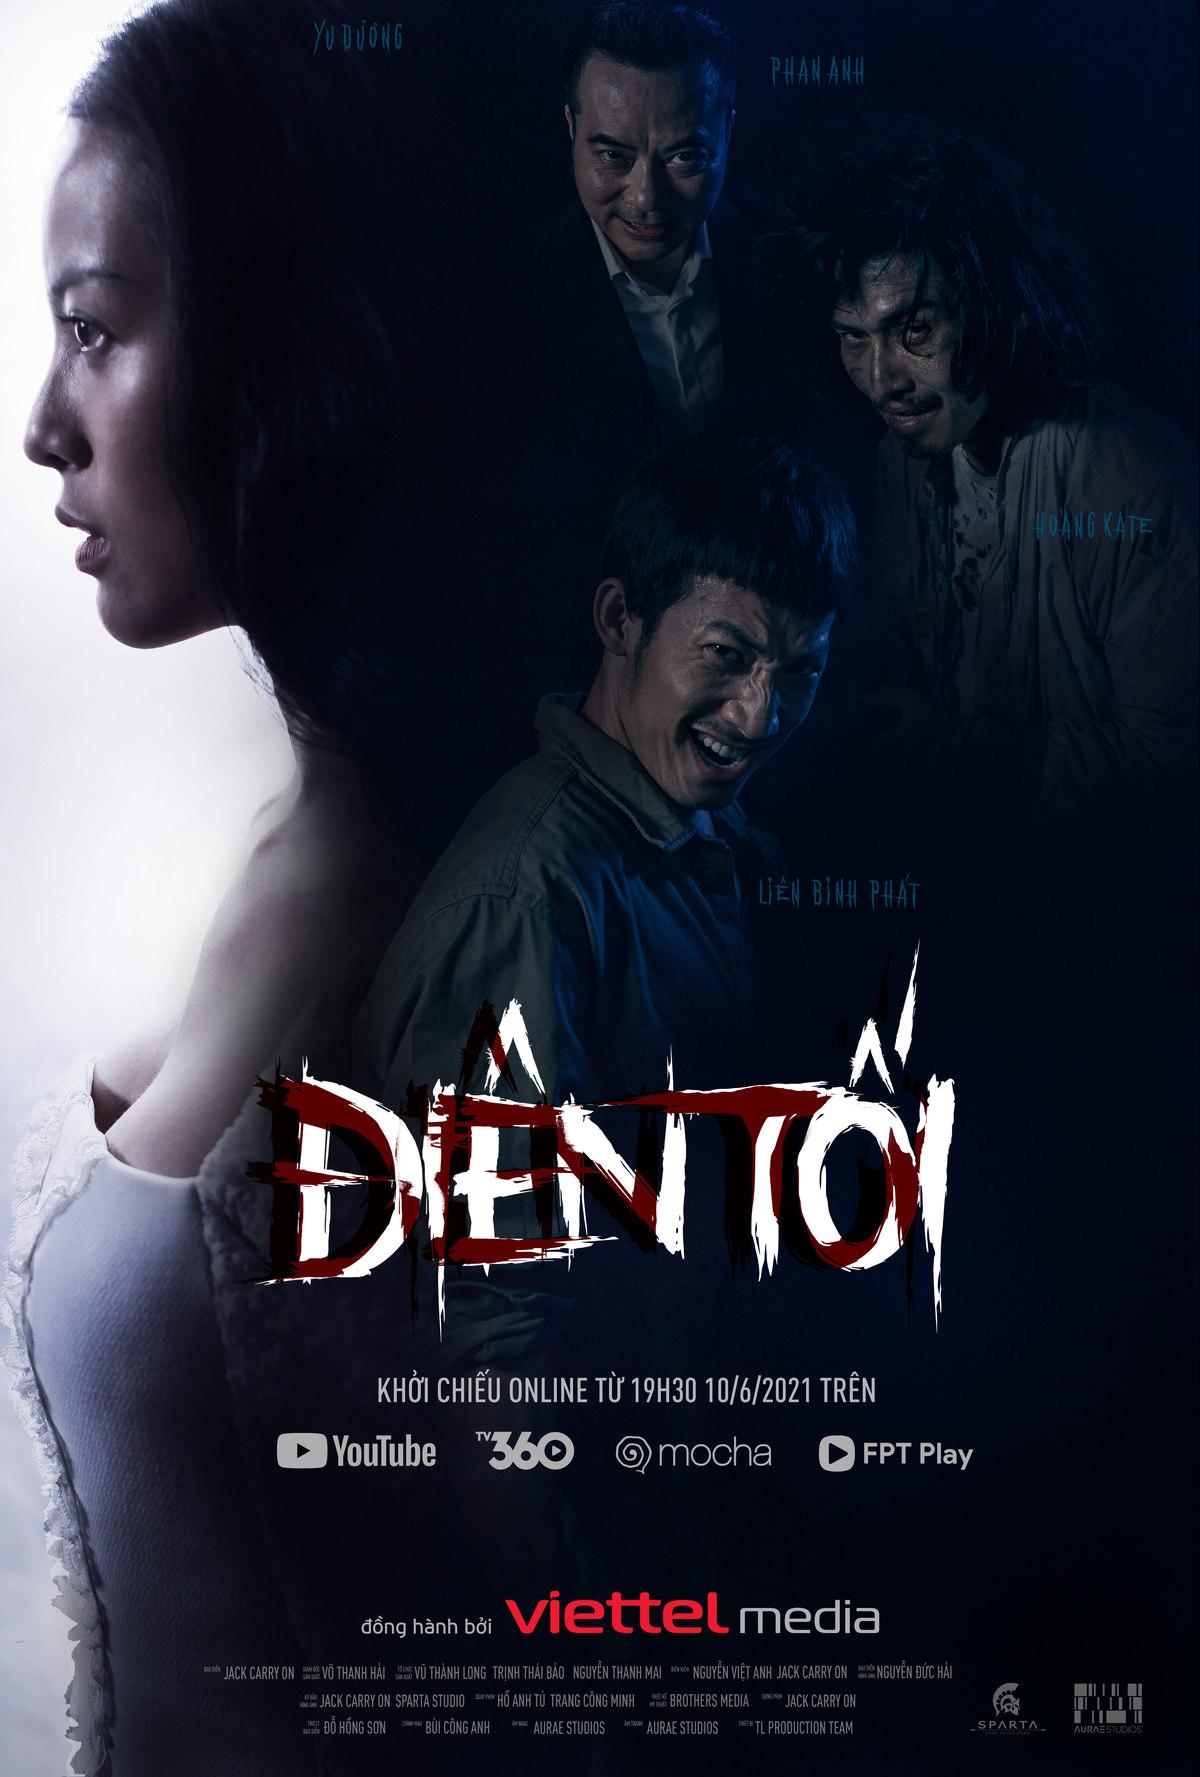 Dien Toi (2021) Full Movie [In Vietnamese] With Hindi Subtitles | WebRip 720p [1XBET]